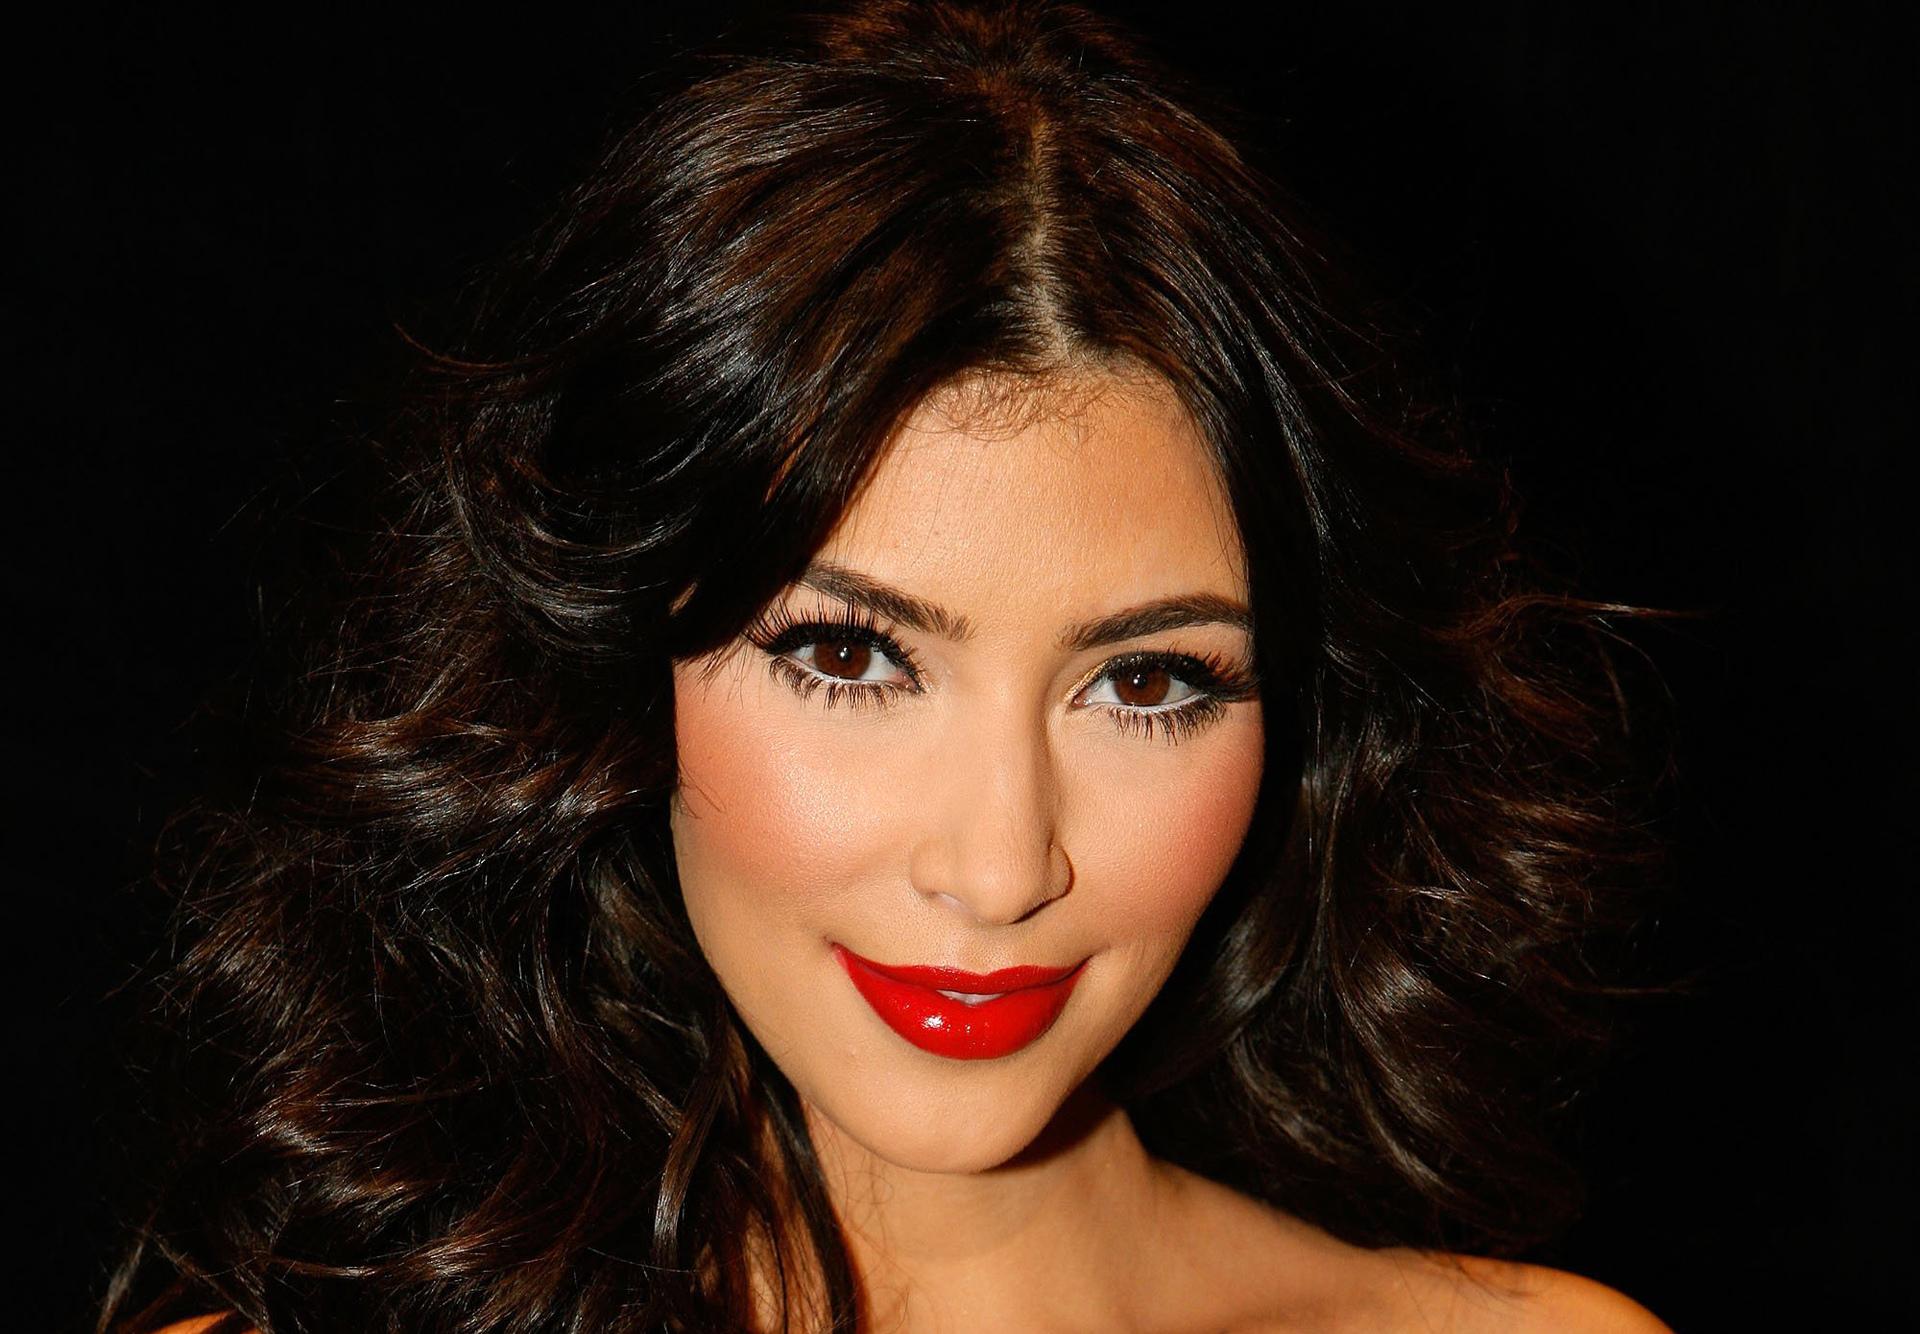 Fondos De Pantalla De Kim Kardashian Wallpapers Hd Gratis